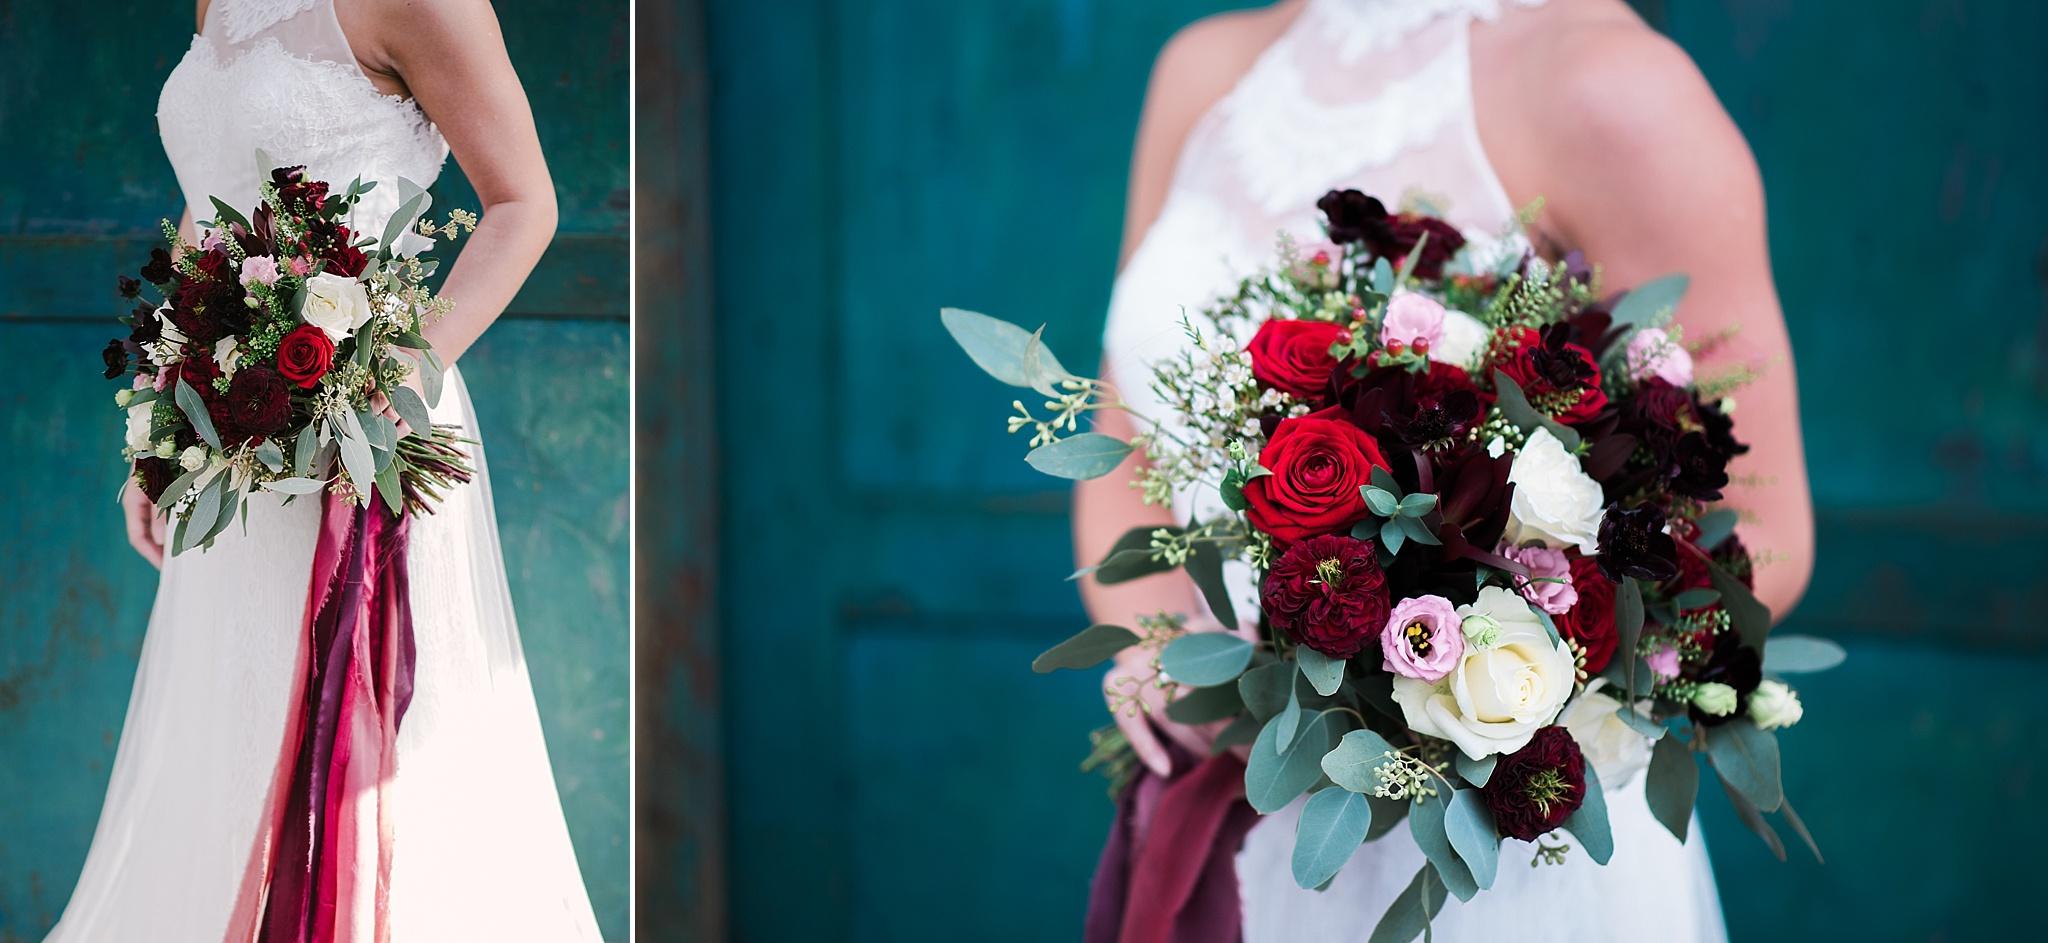 Closeup of the brides wedding bouquet.